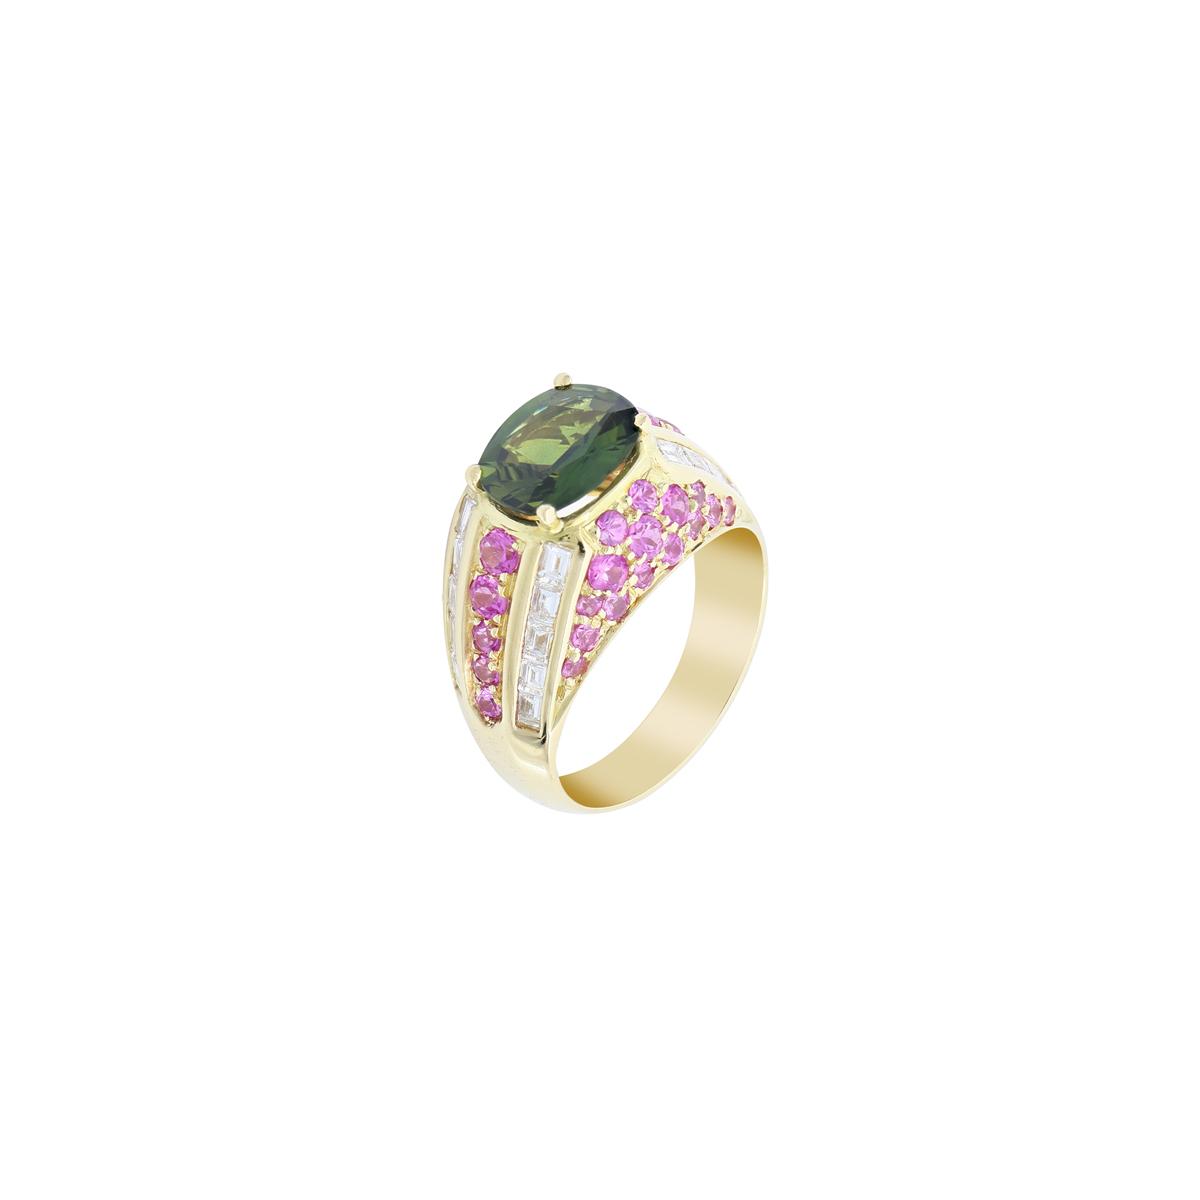 Cushion-Cut Sapphire Ring with Diamonds